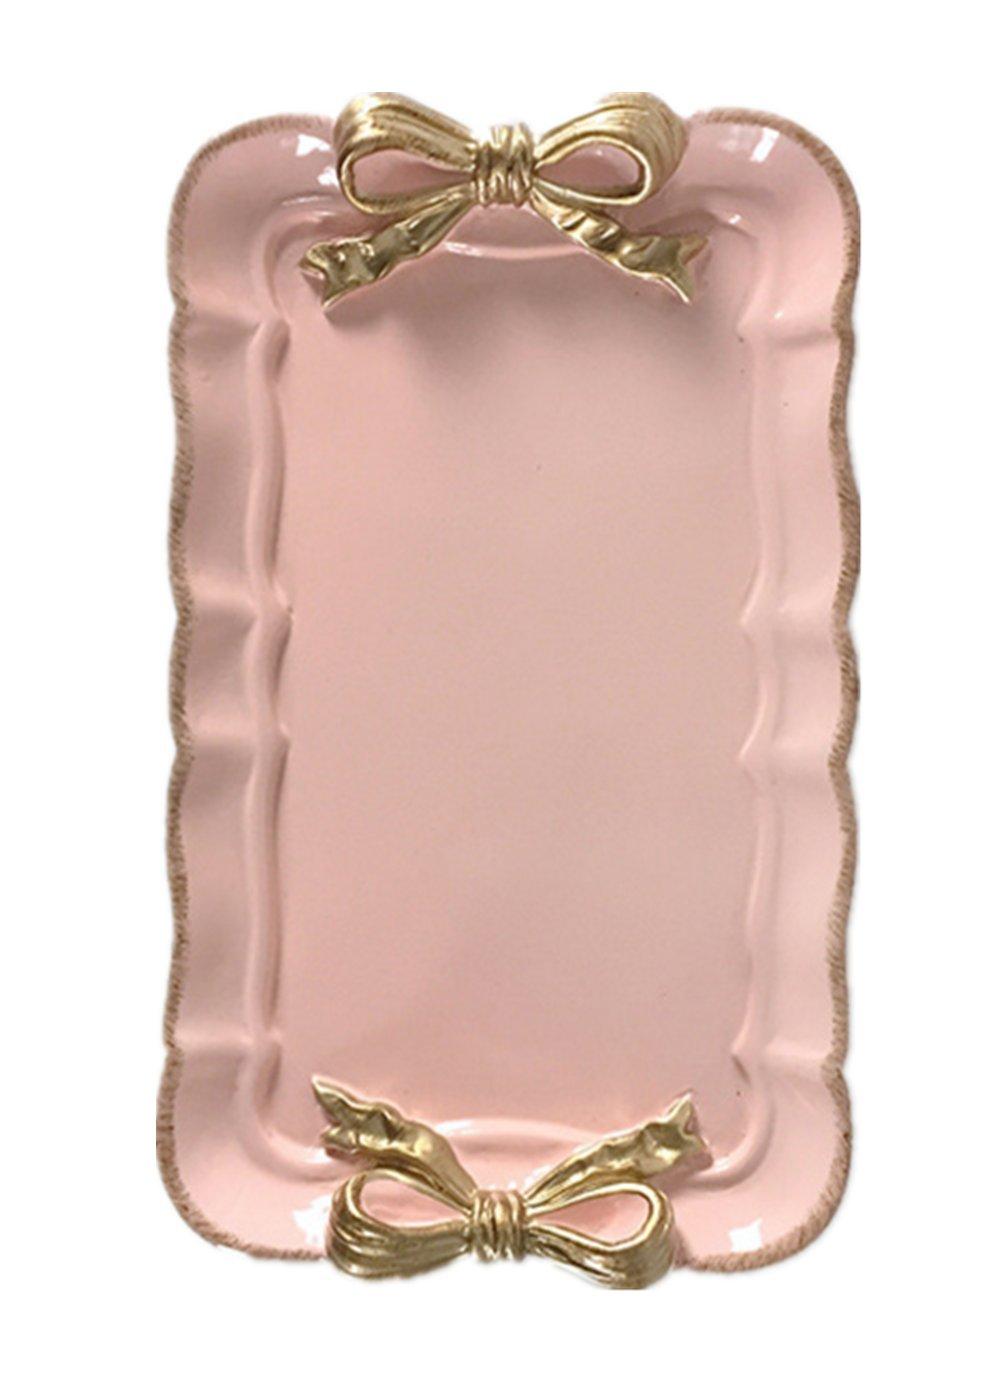 Snack Cake Ceramic Pineapple Leaf Plate Tray (White)